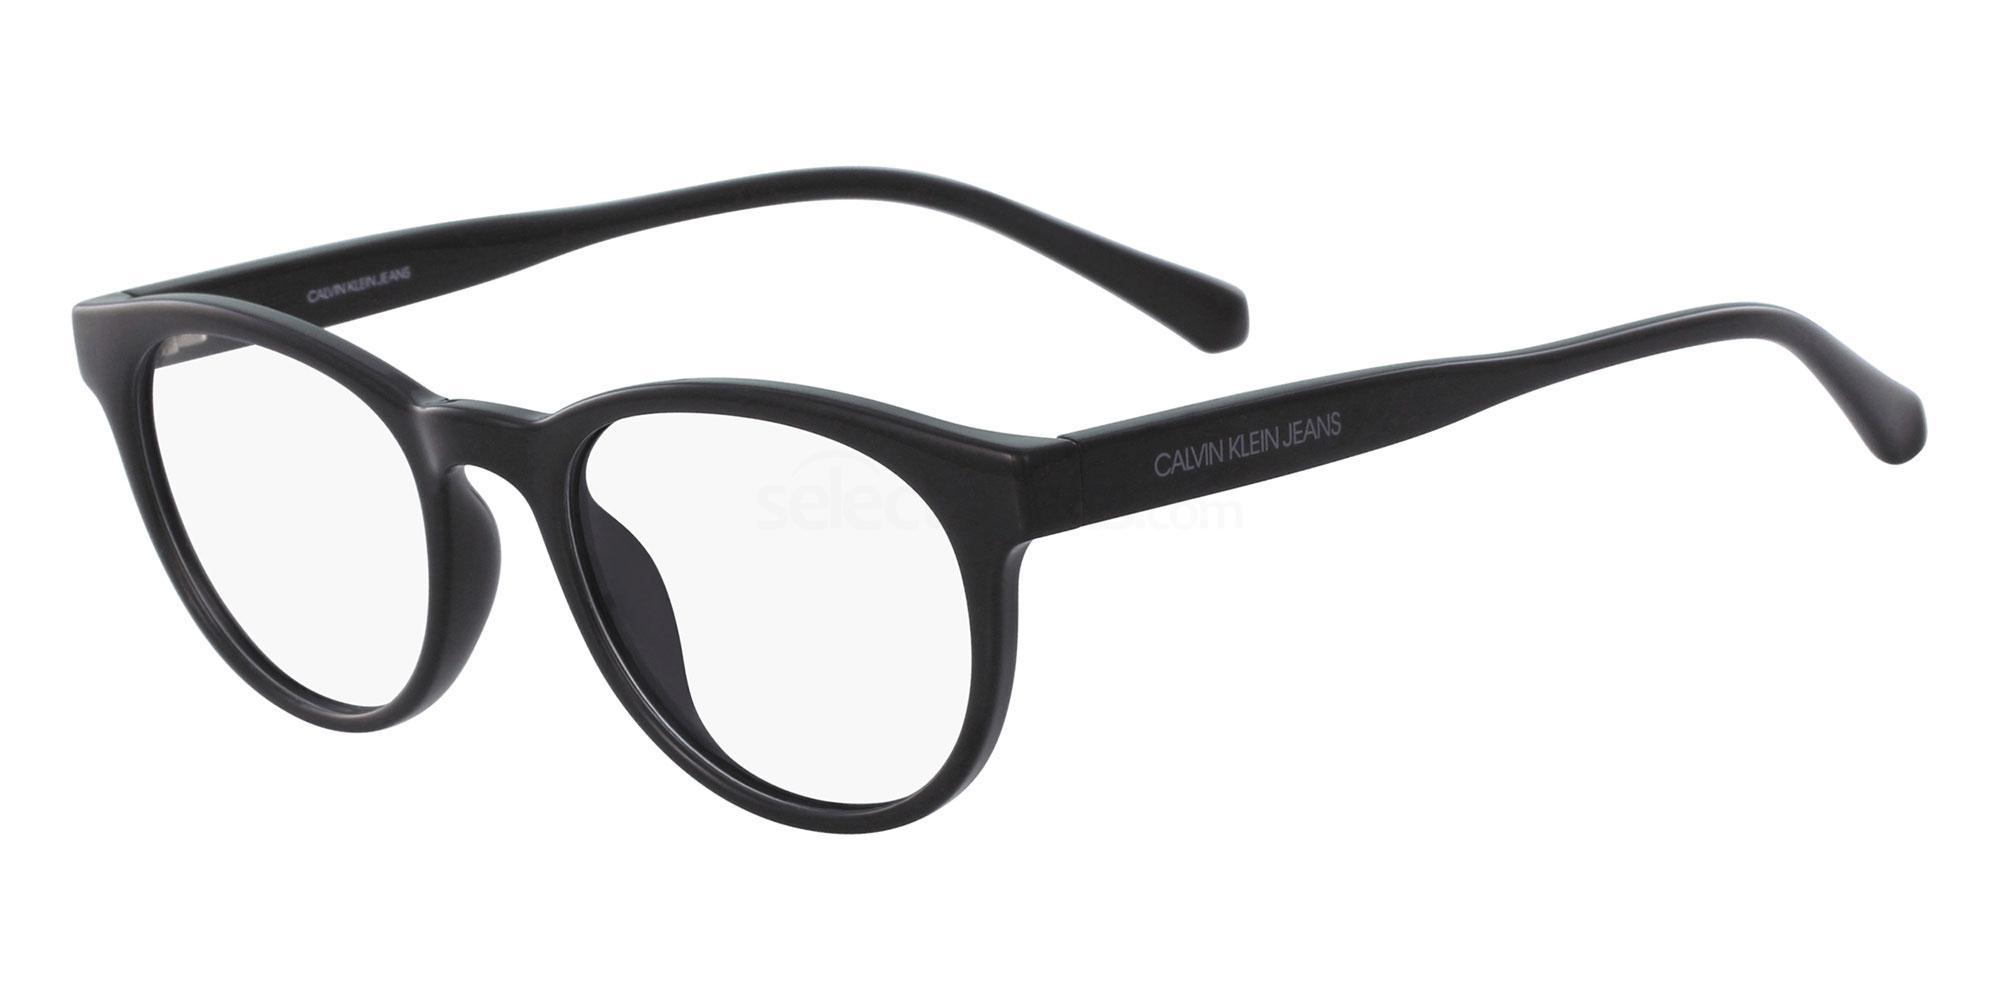 001 CKJ19506 Glasses, Calvin Klein Jeans